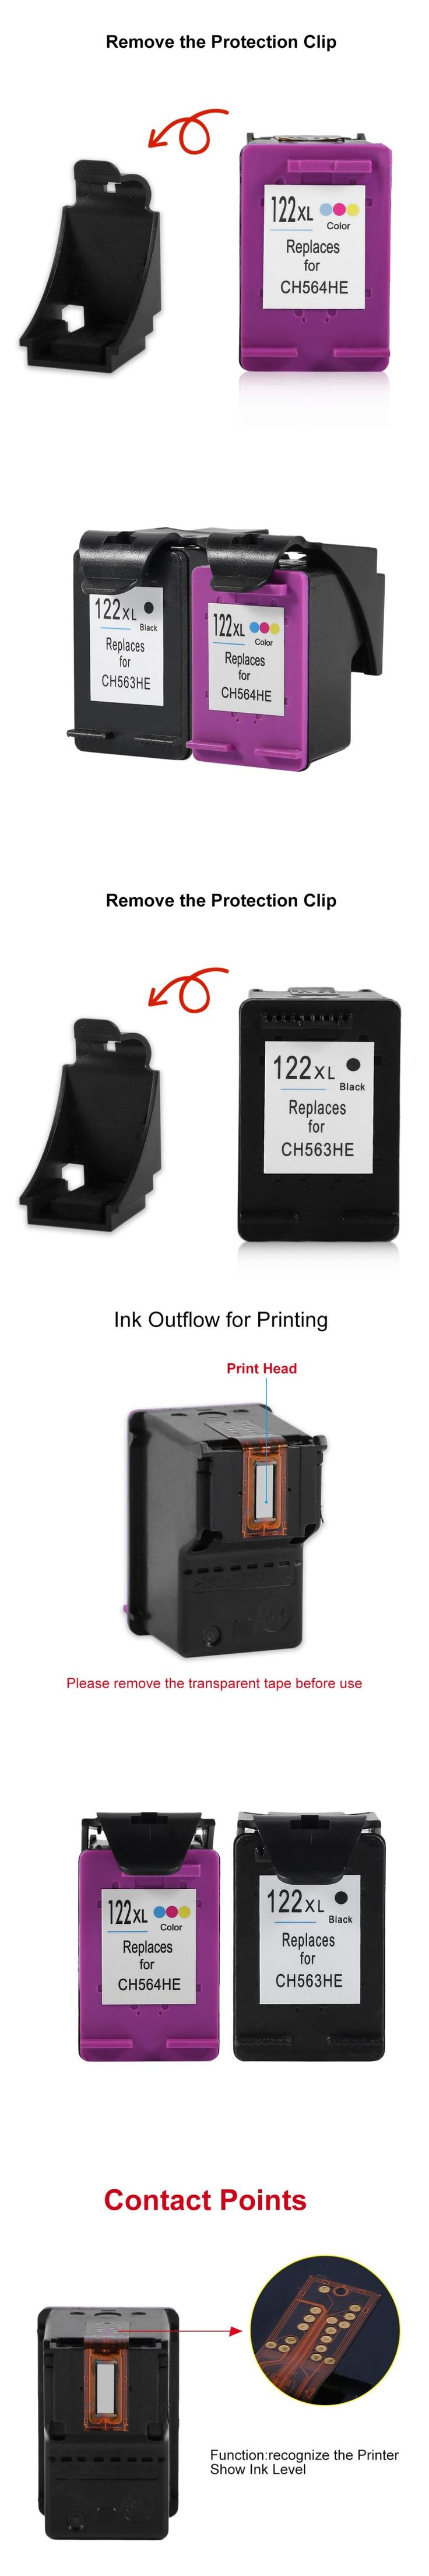 2Pcs For HP Cartridge 122 for HP 122 XL 122XL Ink Cartridge for HP Deskjet 1000